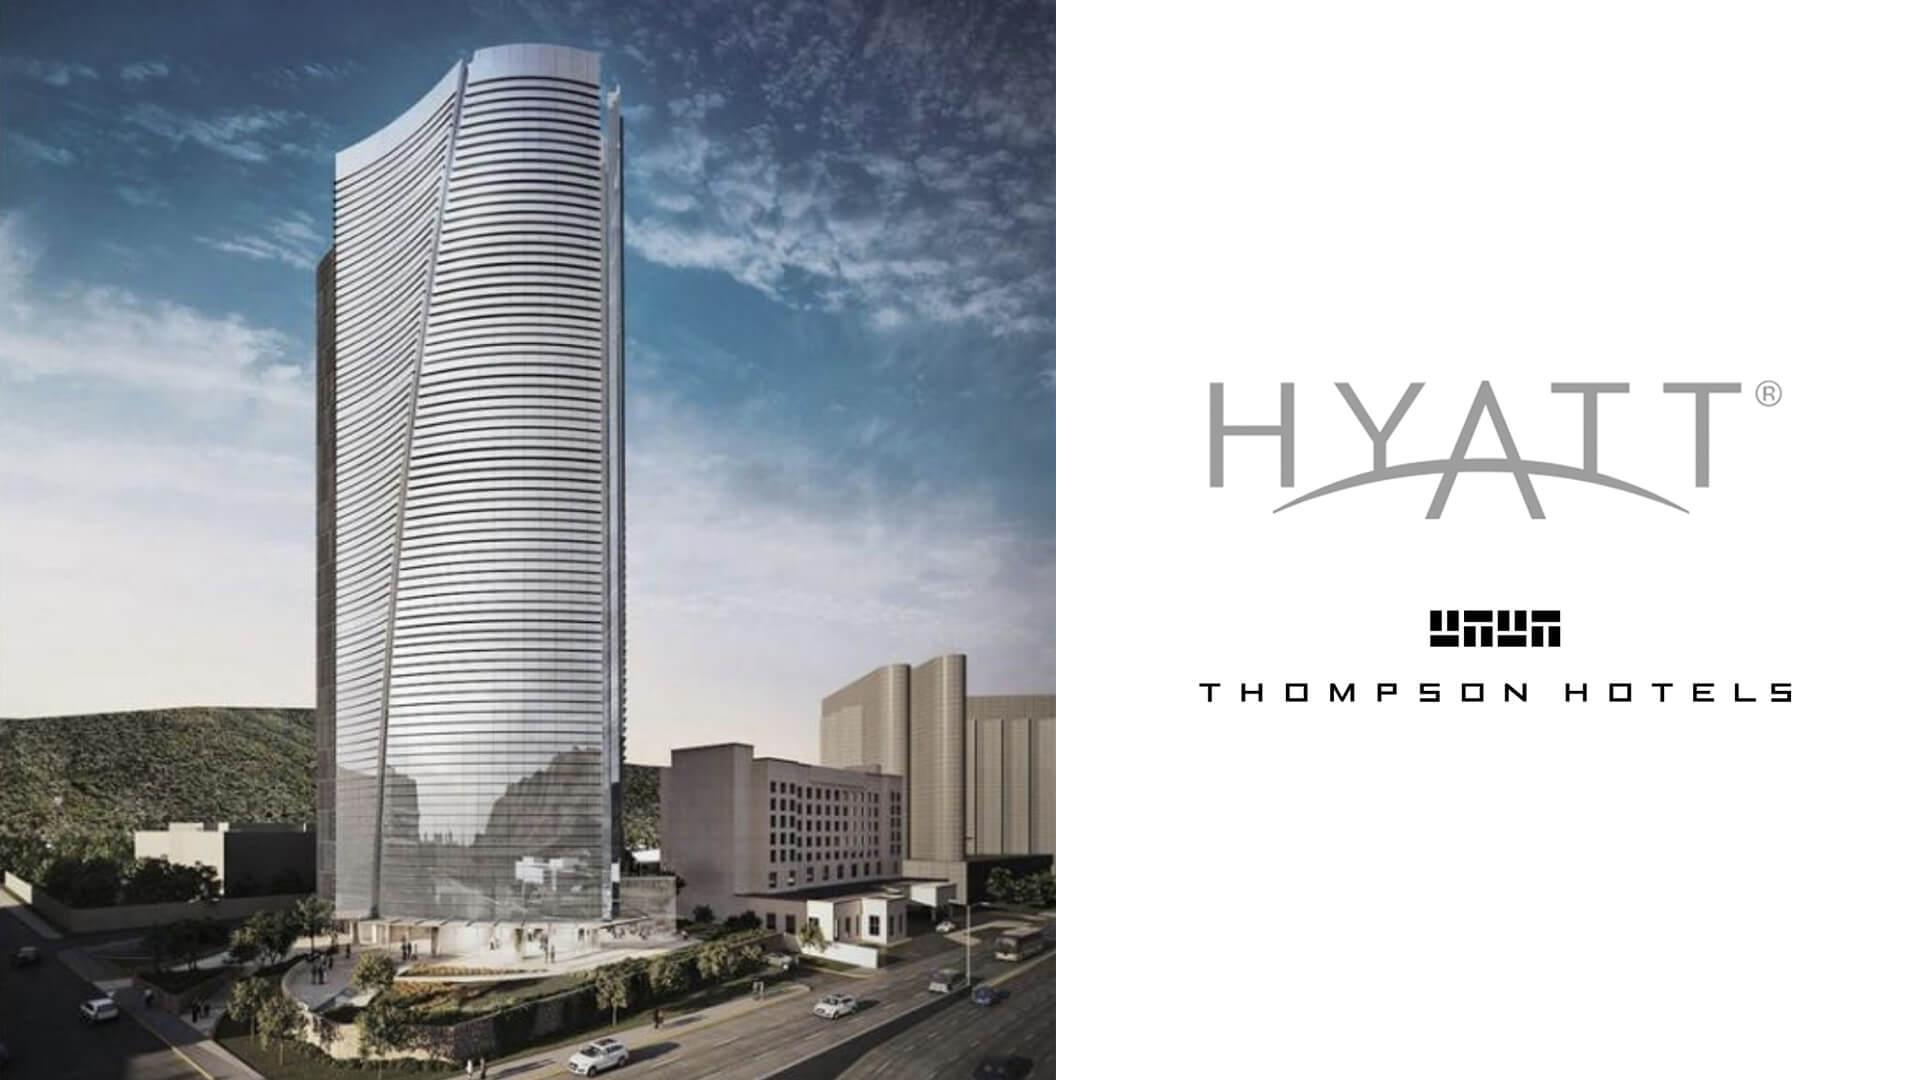 Thomson hotels